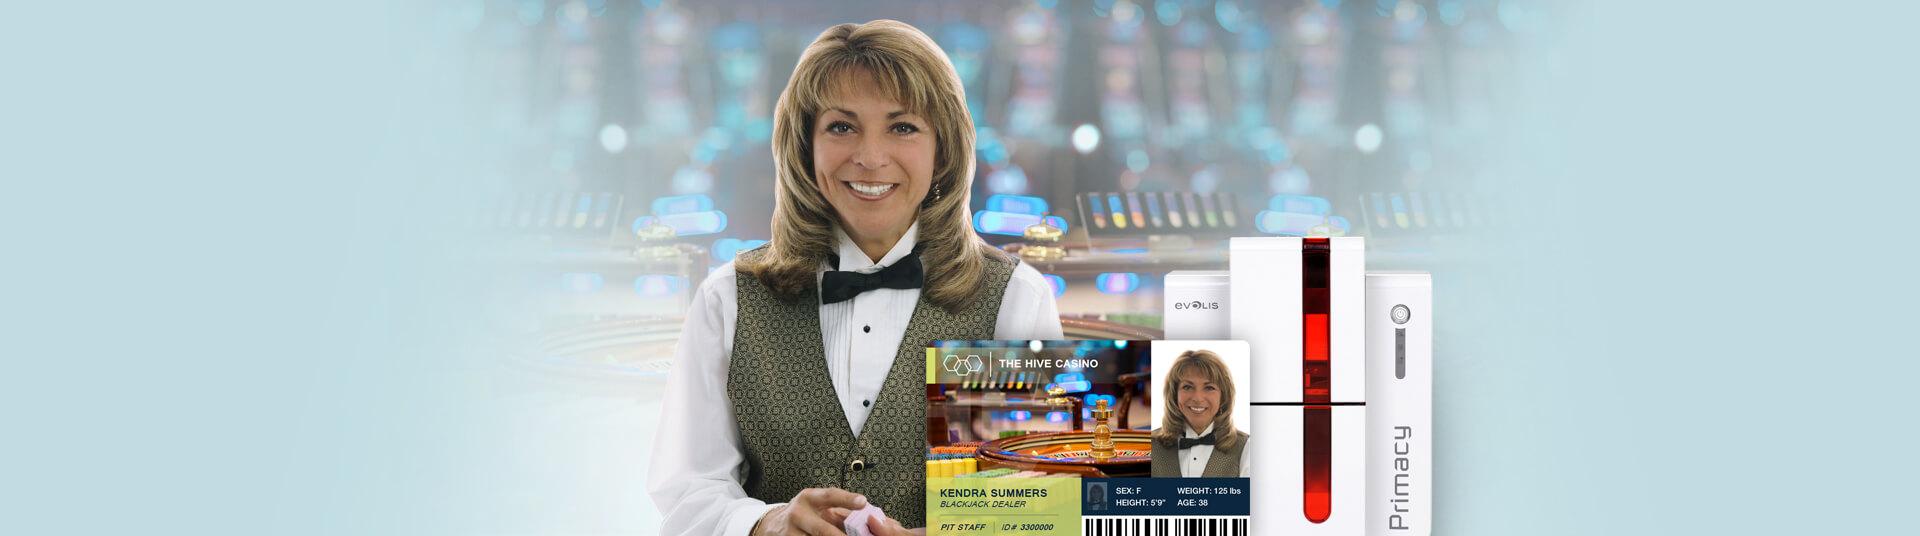 Casino & Gambling Cards